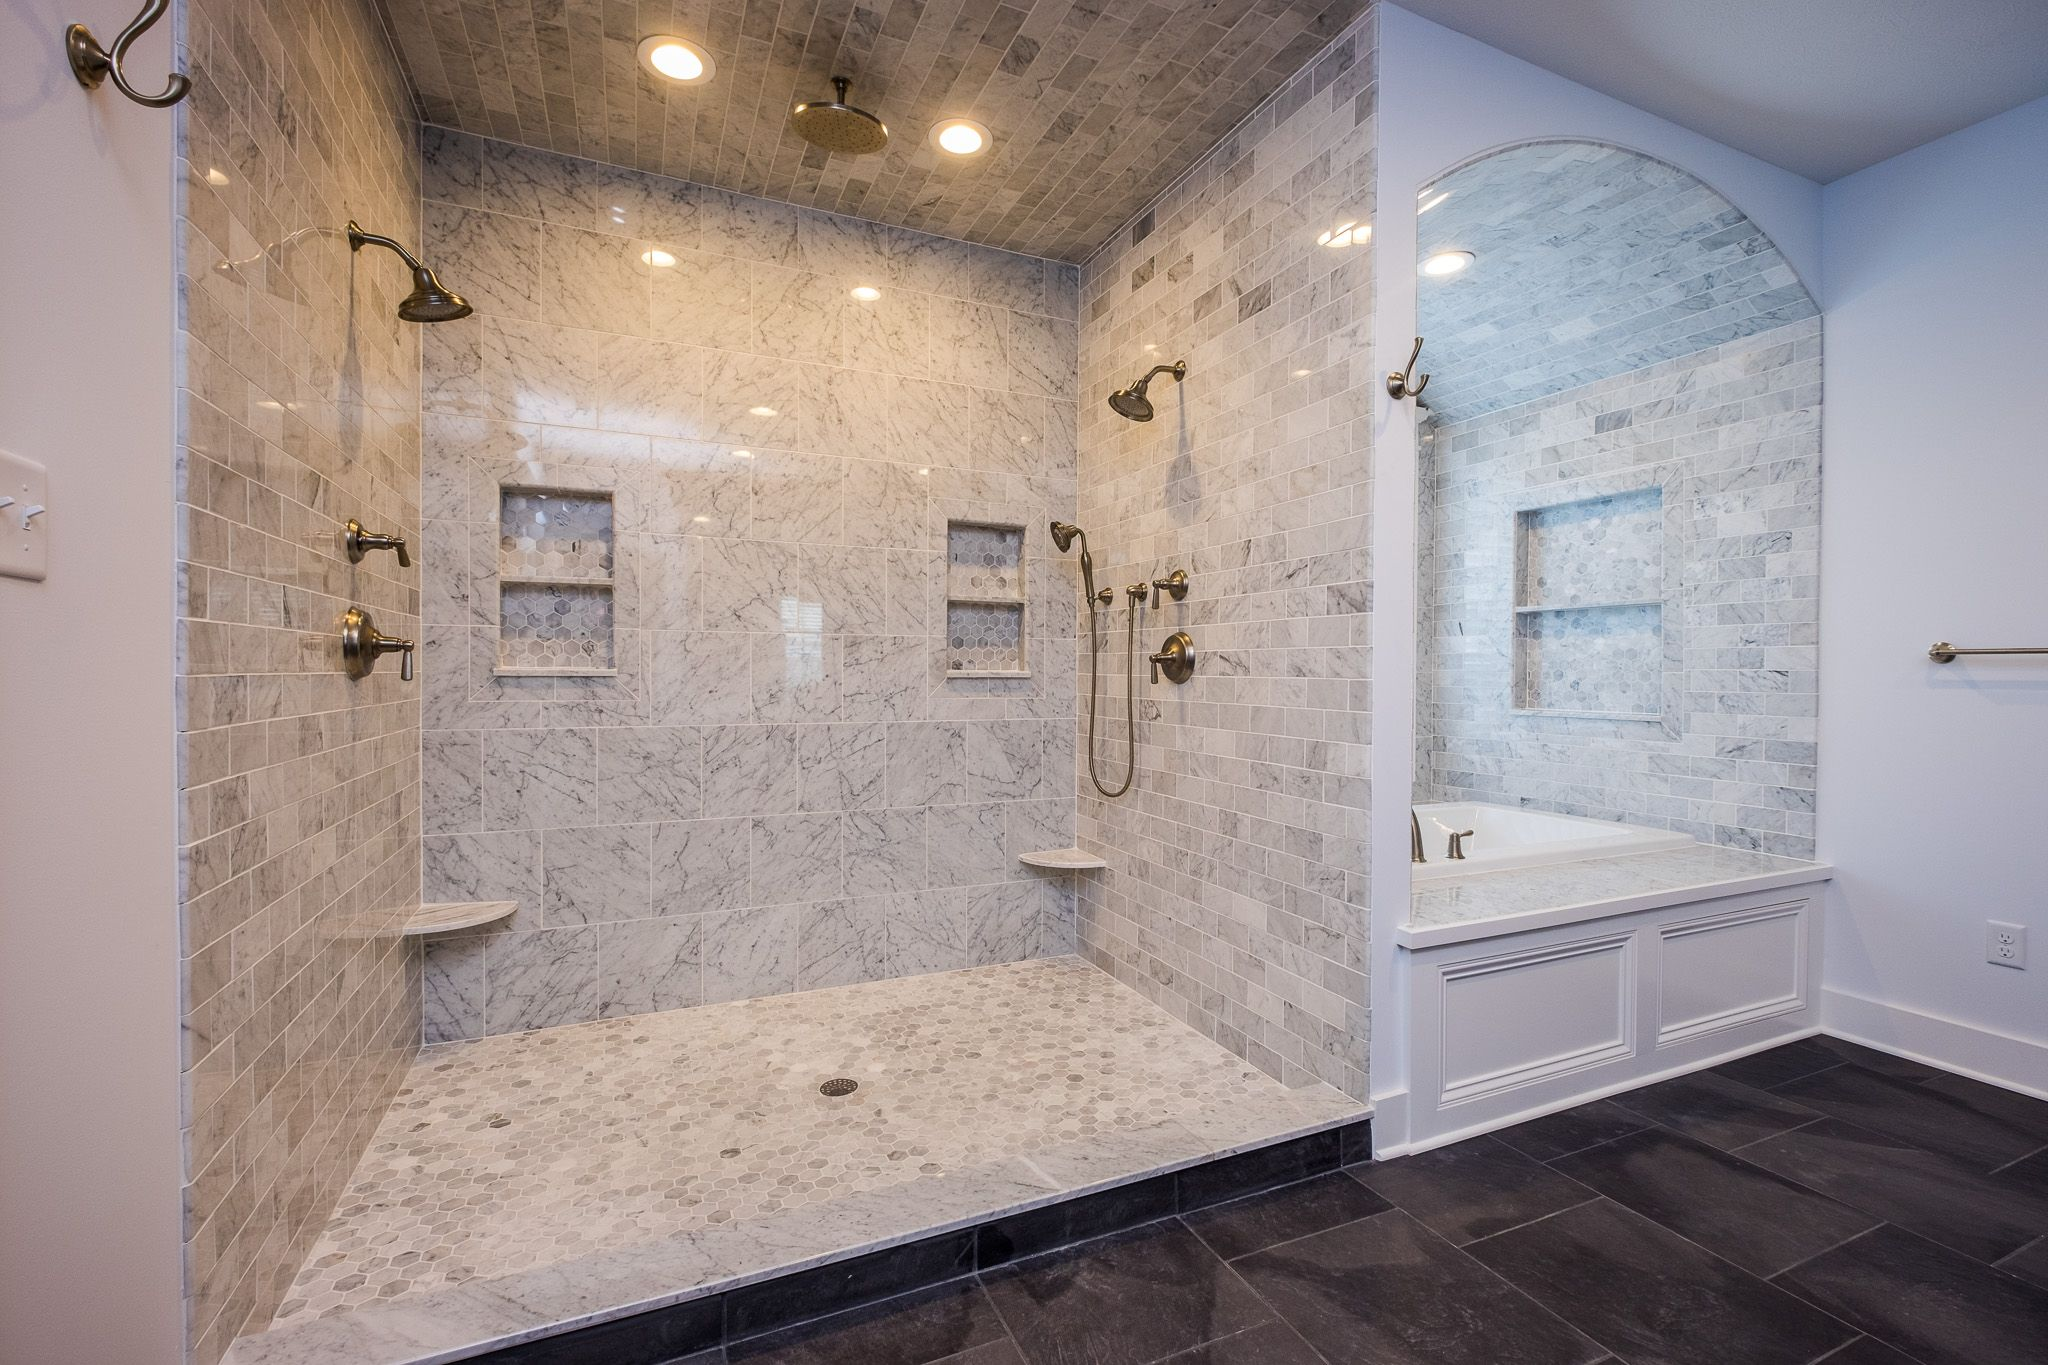 Shower Envy Gorgeous White And Grey Tile Master Bath Tile Shower